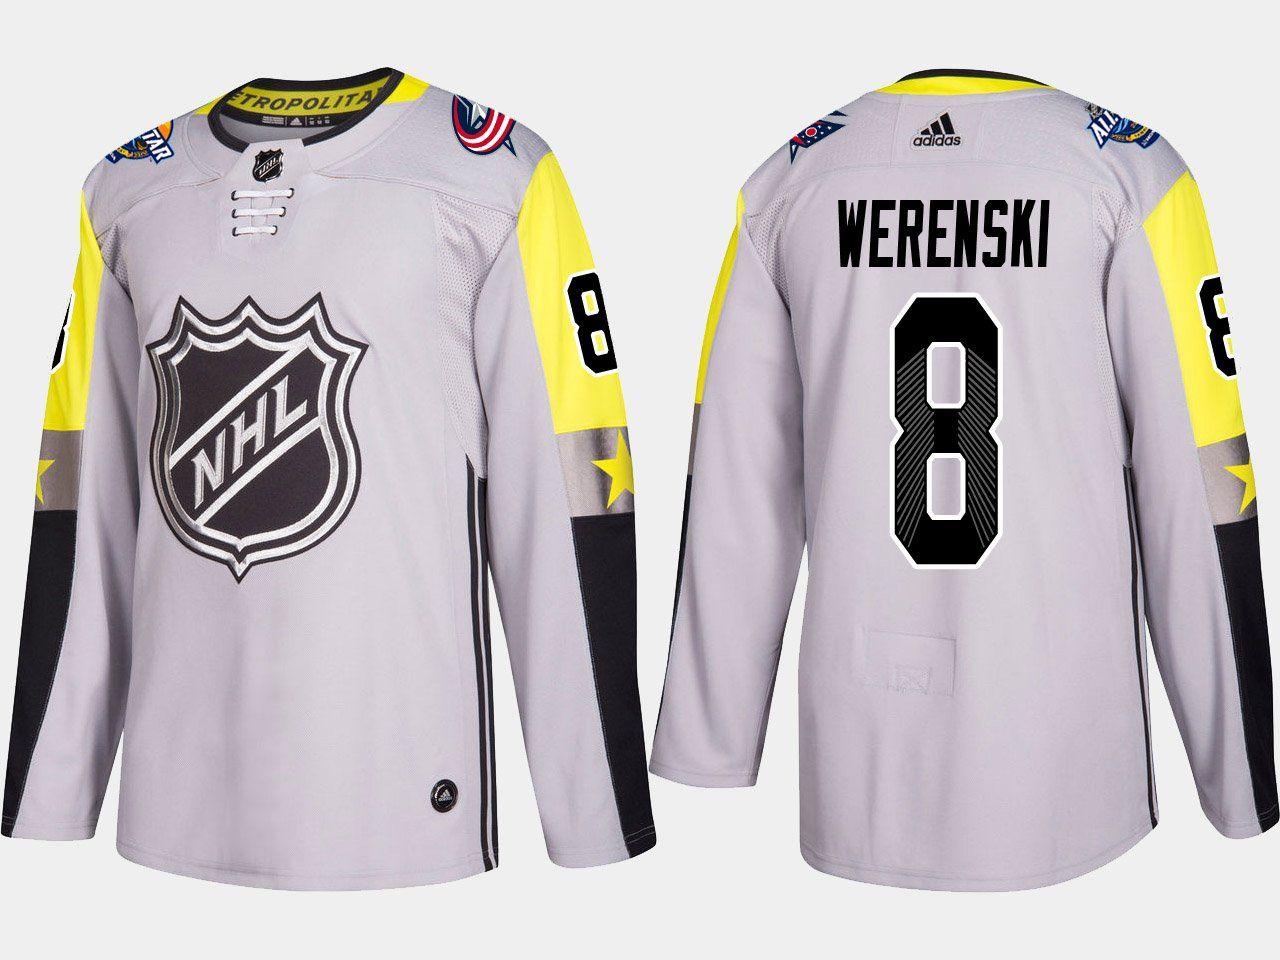 2018 NHL All Star Metropolitan Division Premier Adidas Jerseys  cee3f824a